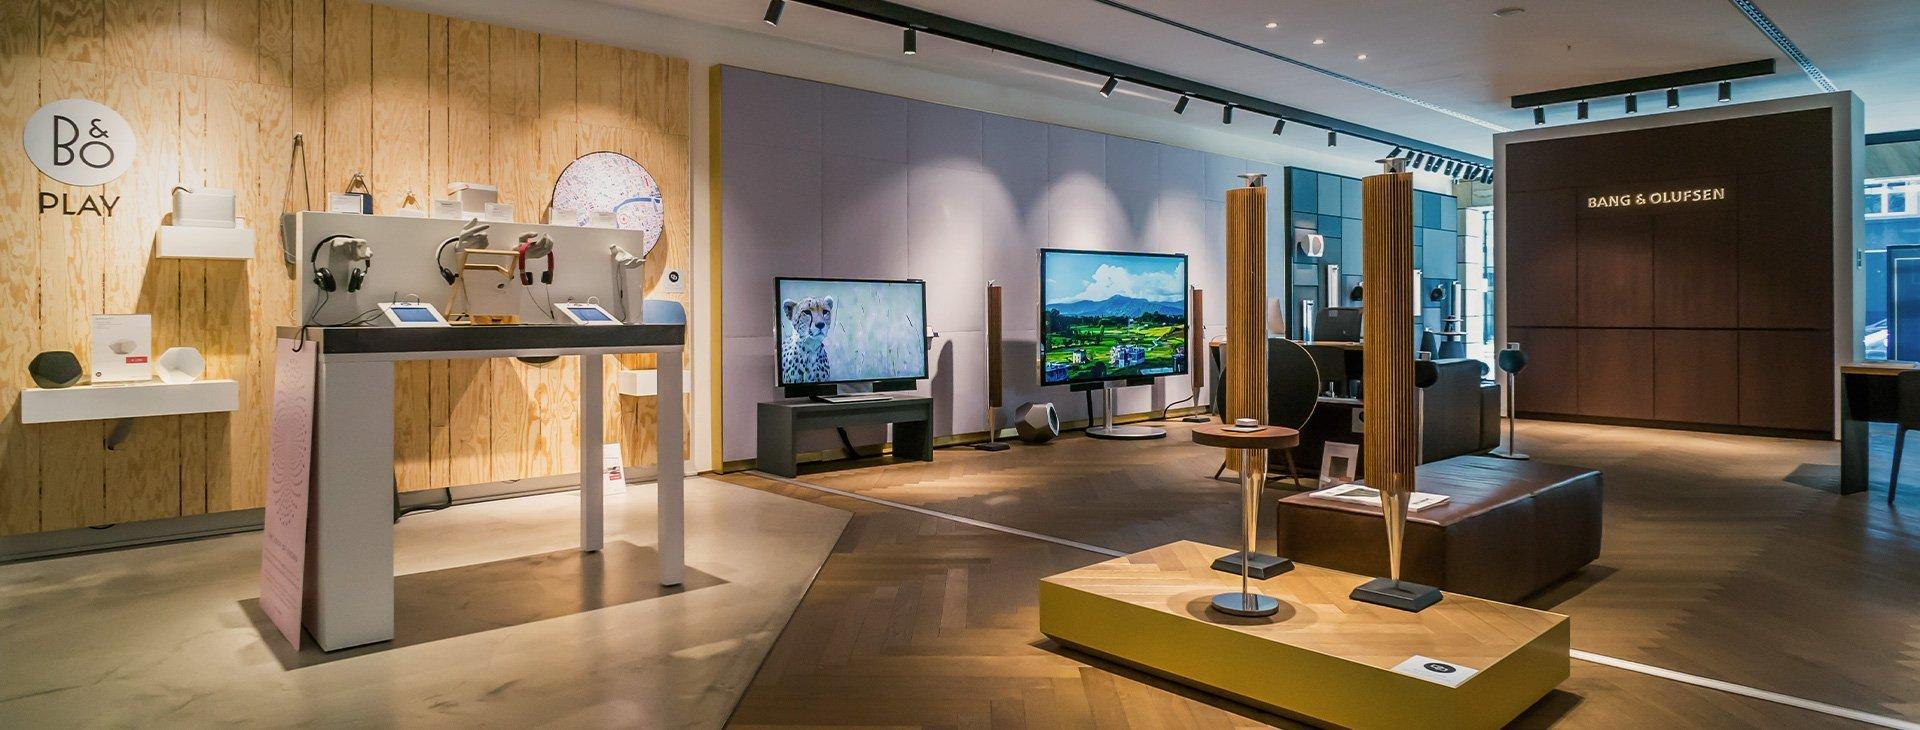 bang olufsen ihre stores im stilwerk berlin. Black Bedroom Furniture Sets. Home Design Ideas